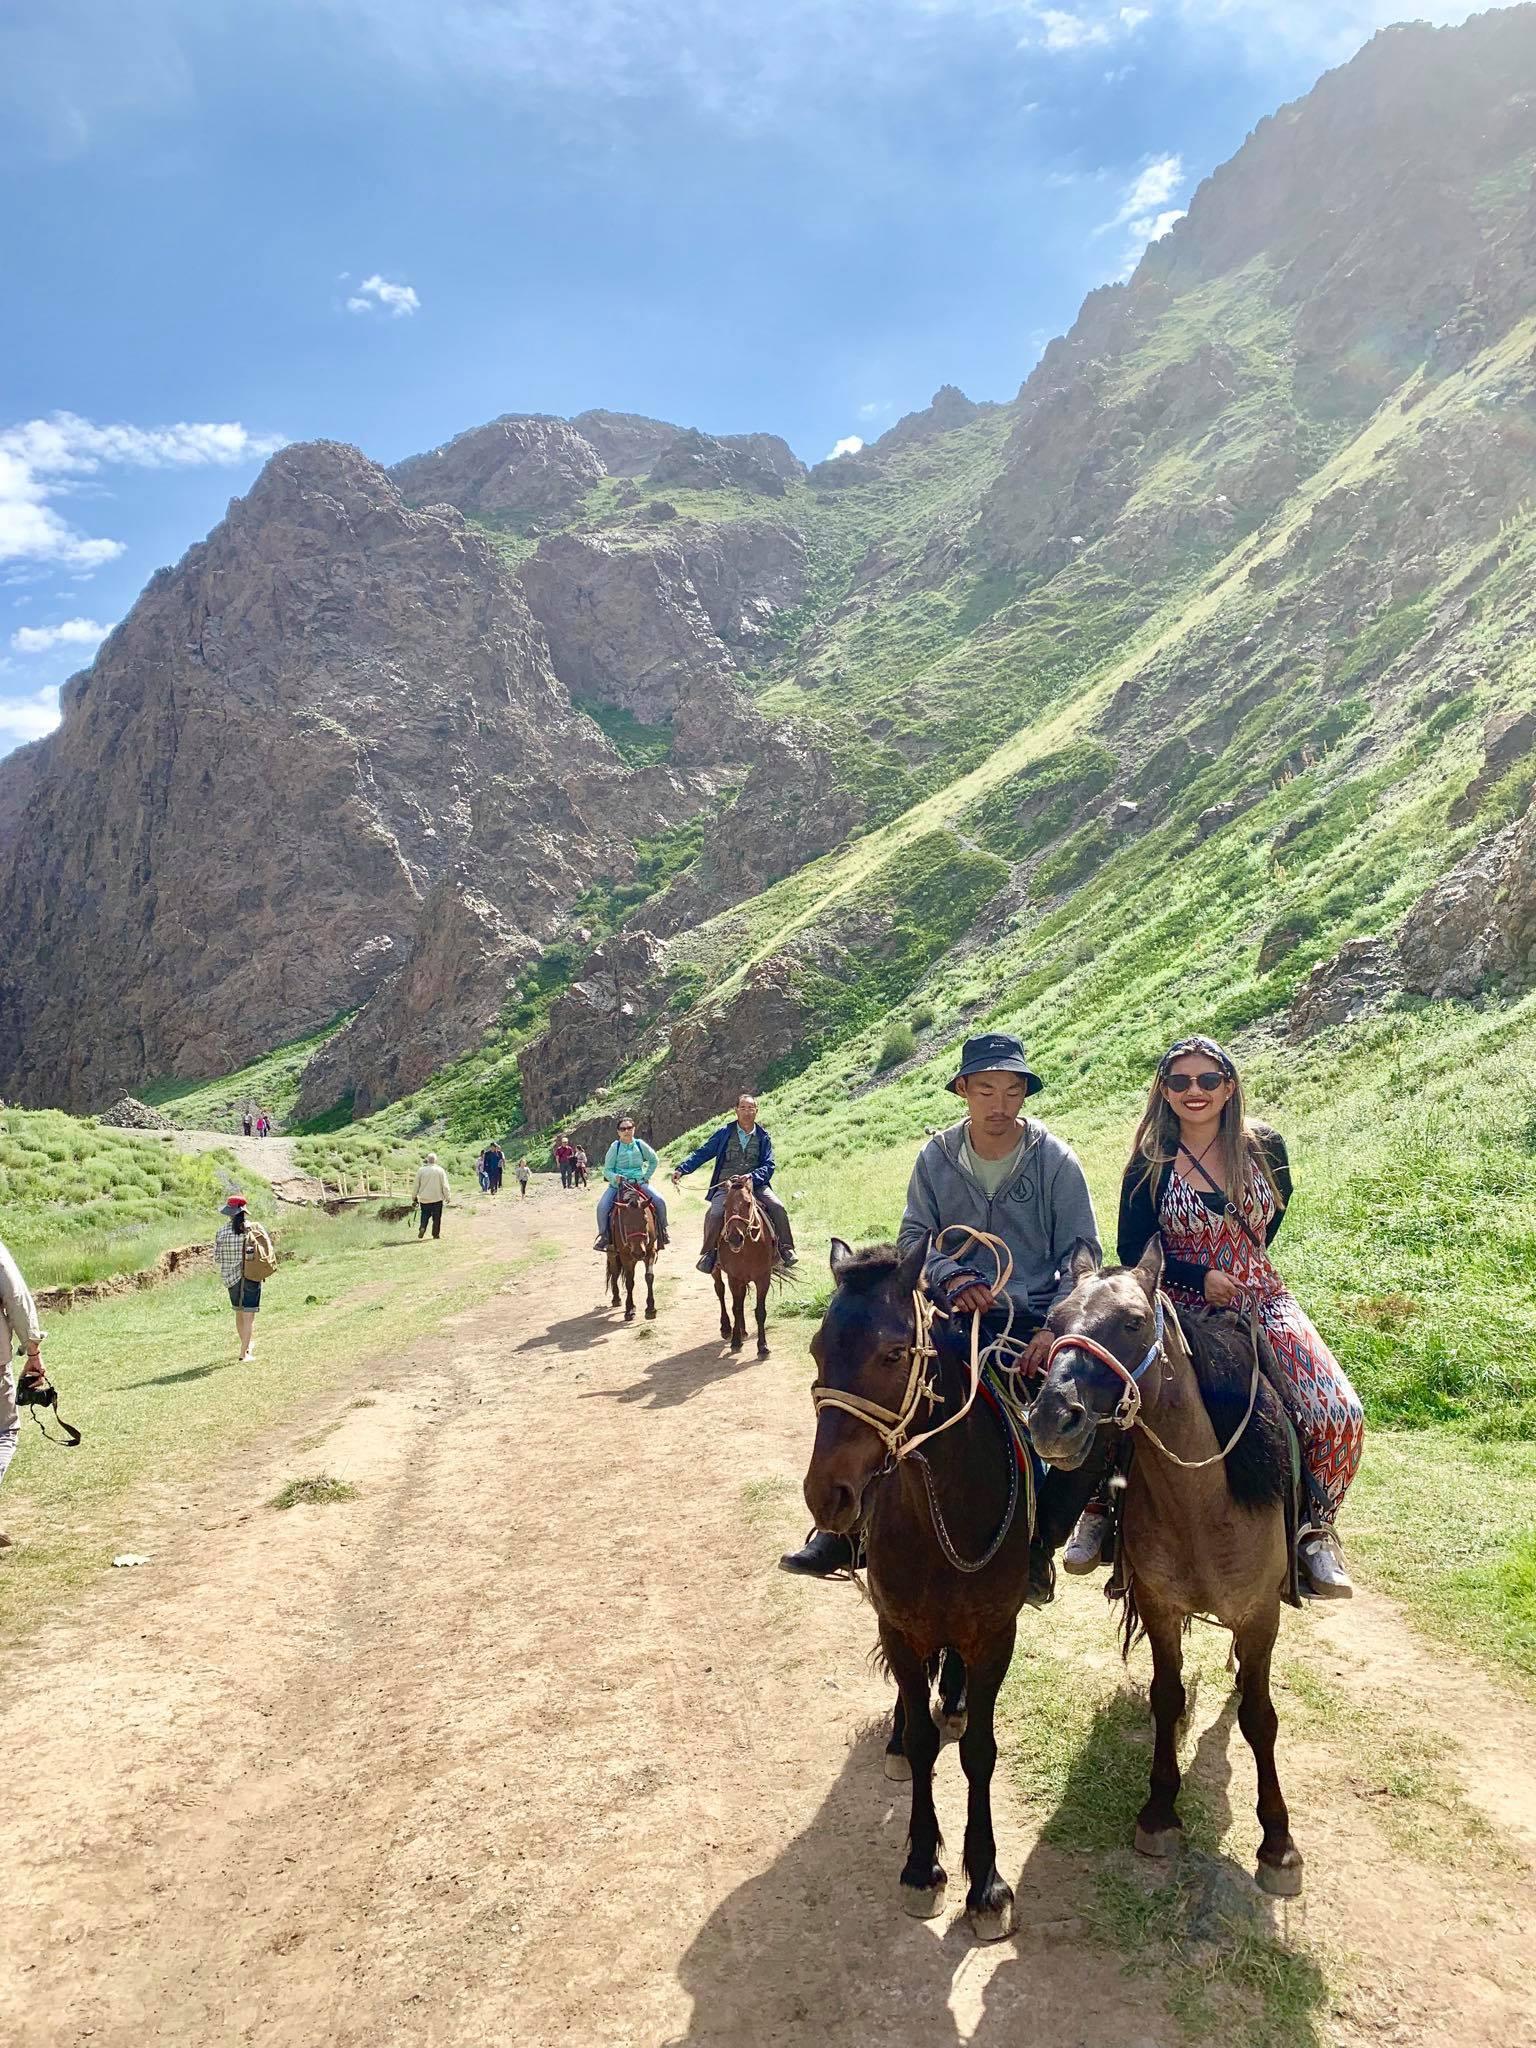 Kach Solo Travels in 2019 Horseback riding trip to the Gobi Gurvan Saikhan National Park10.jpg